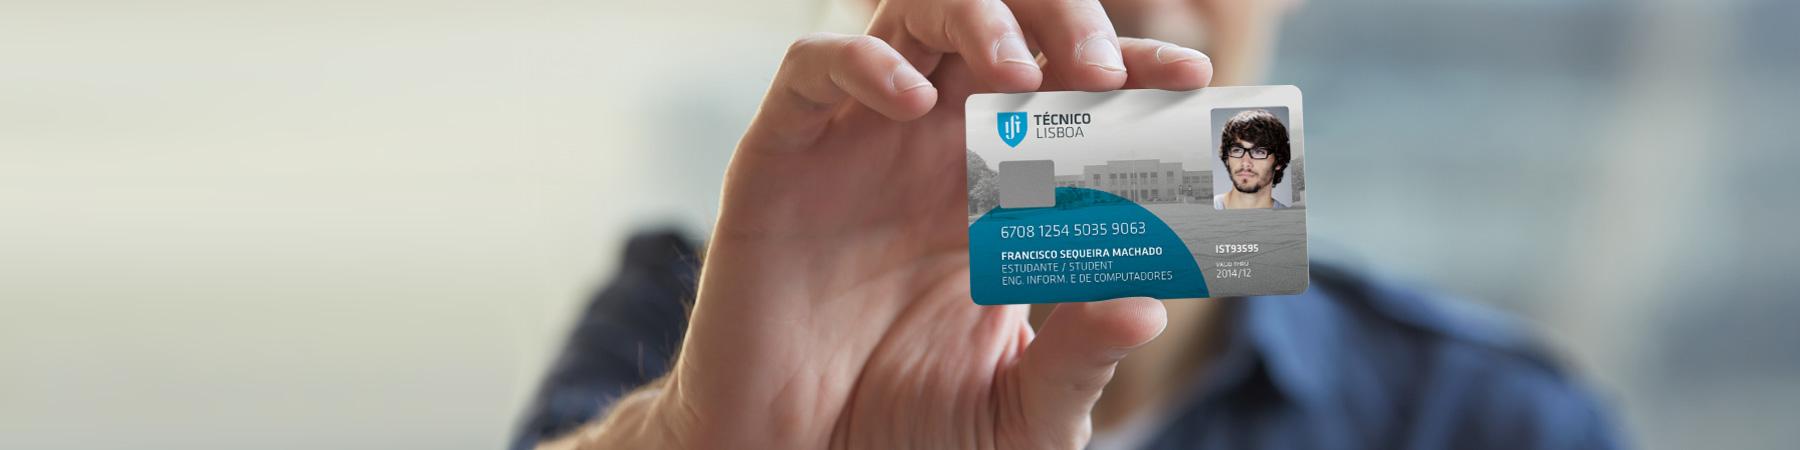 Técnico Identity Card